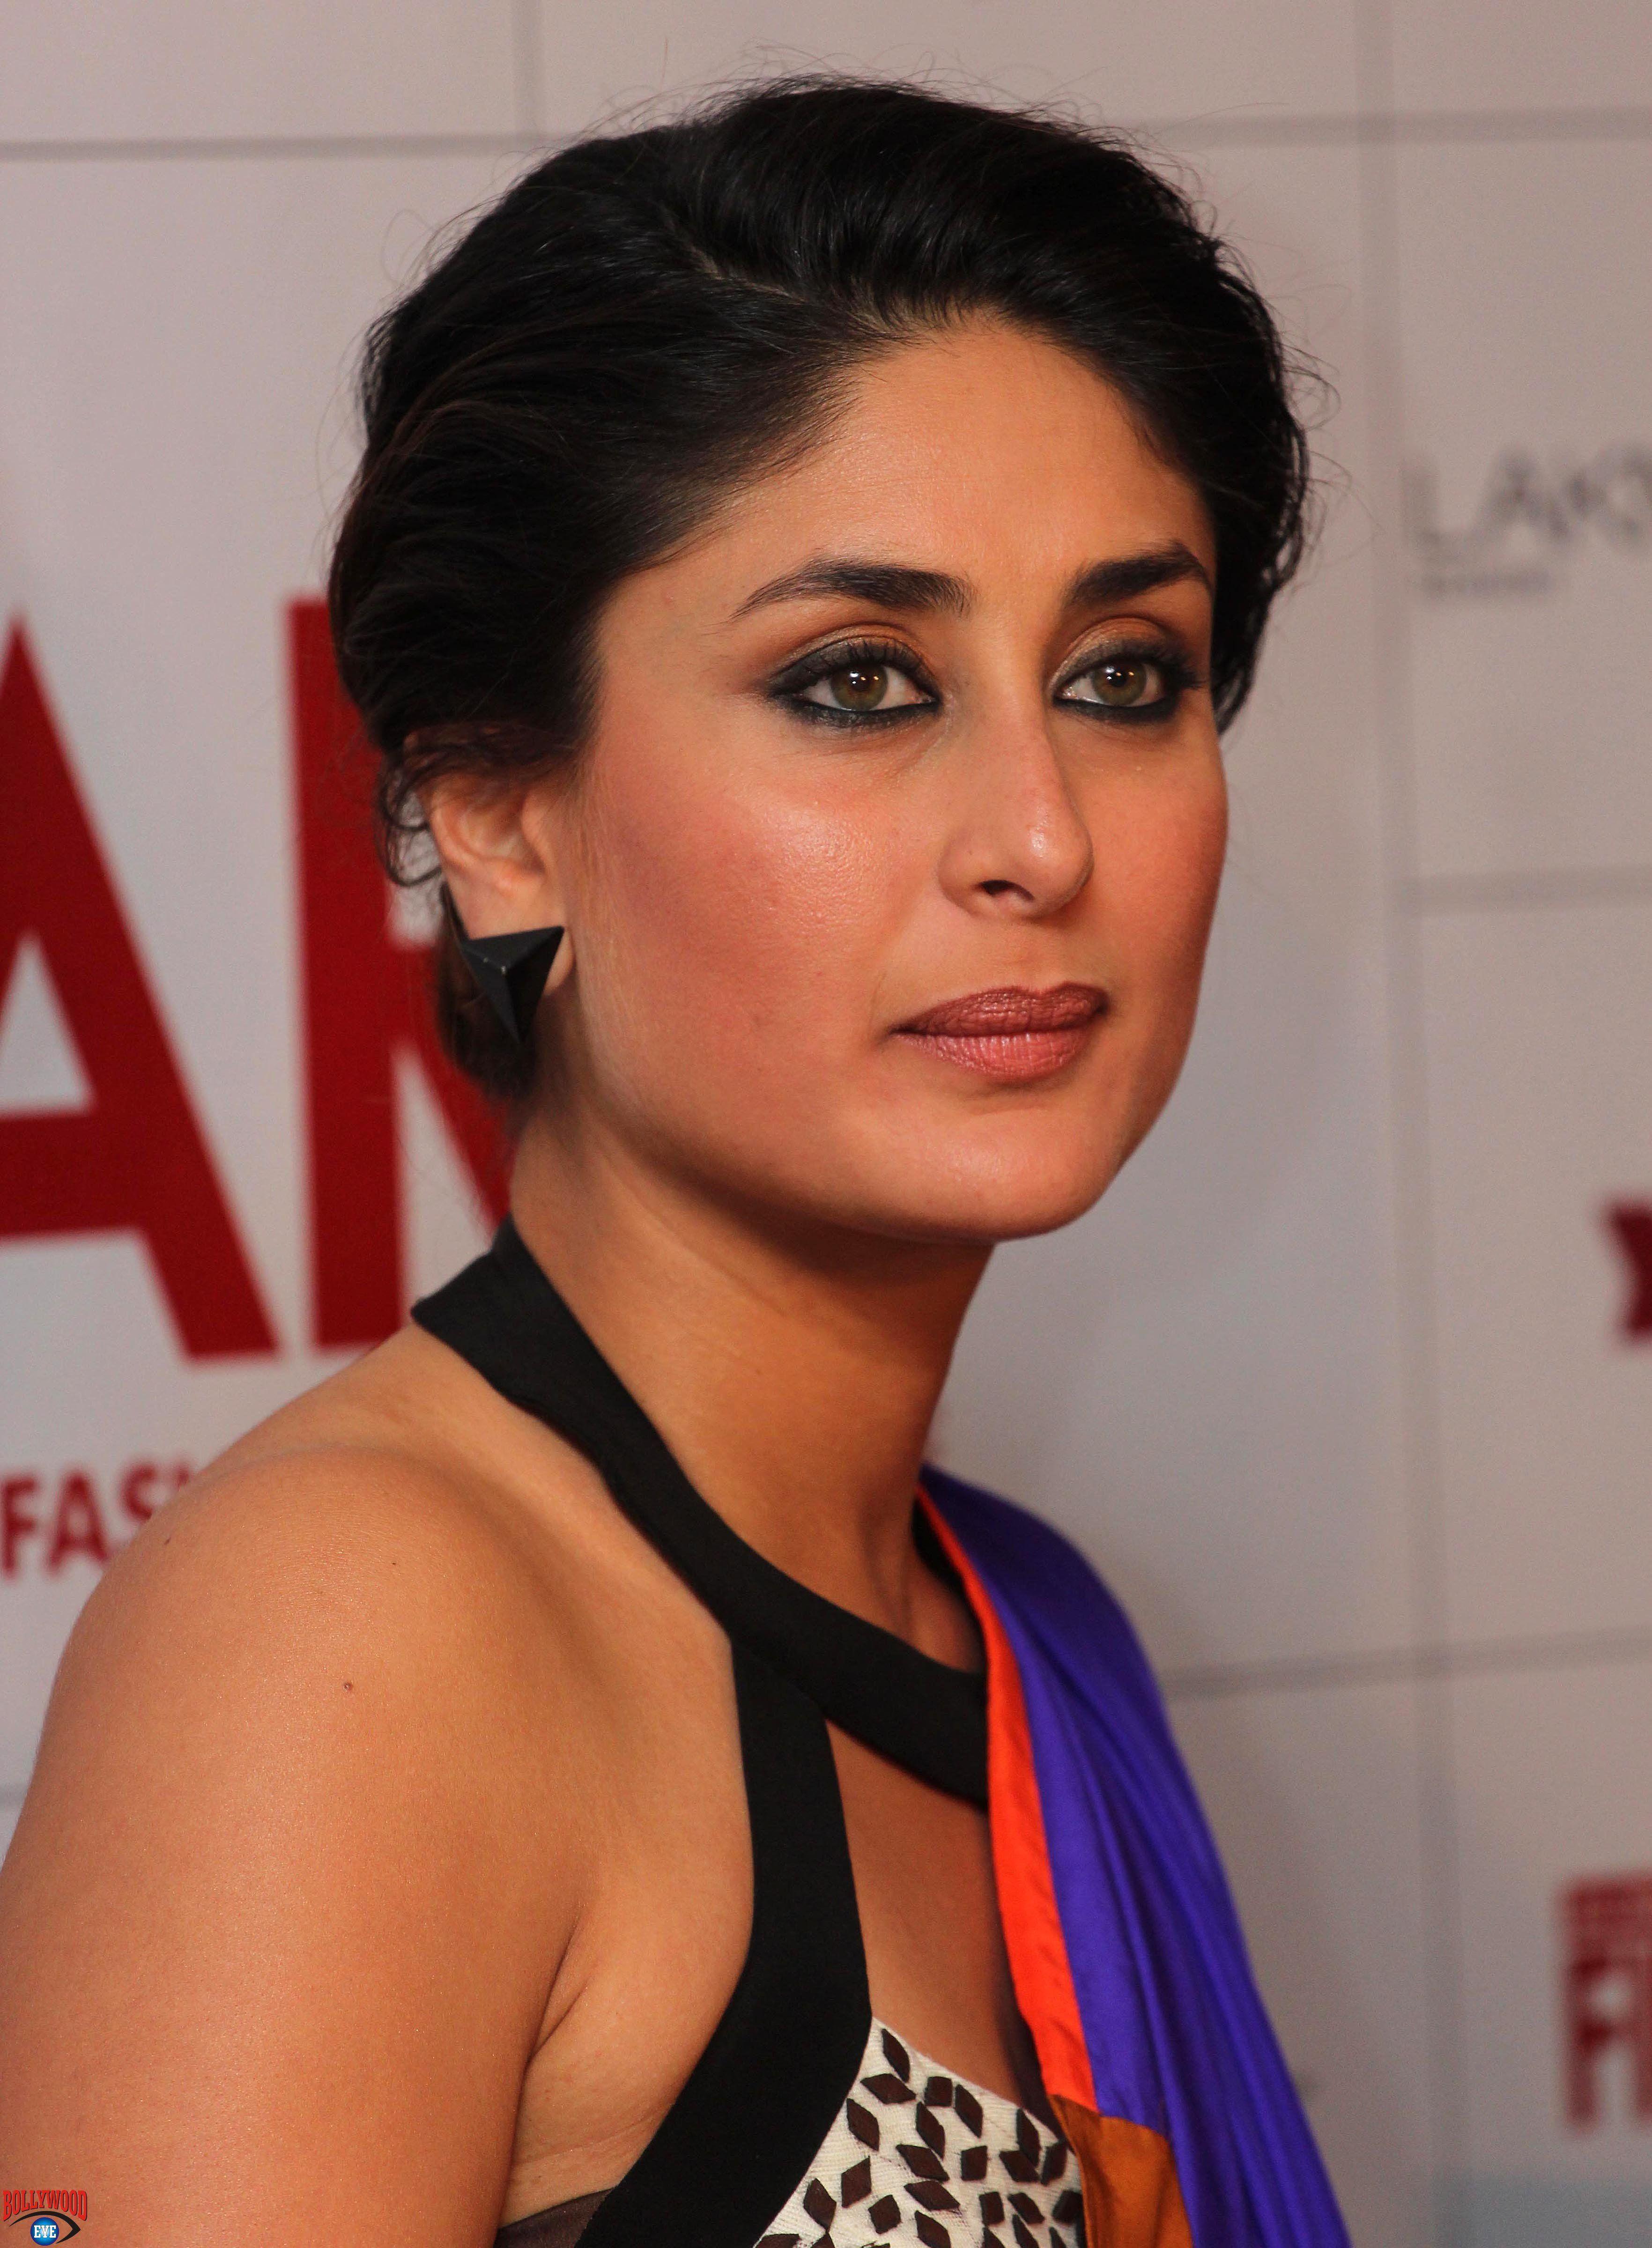 Kareena Kapoor High Resolution Hq Image Collection Unwatermarked Beautiful Bollywood Actress Indian Bollywood Actress Bollywood